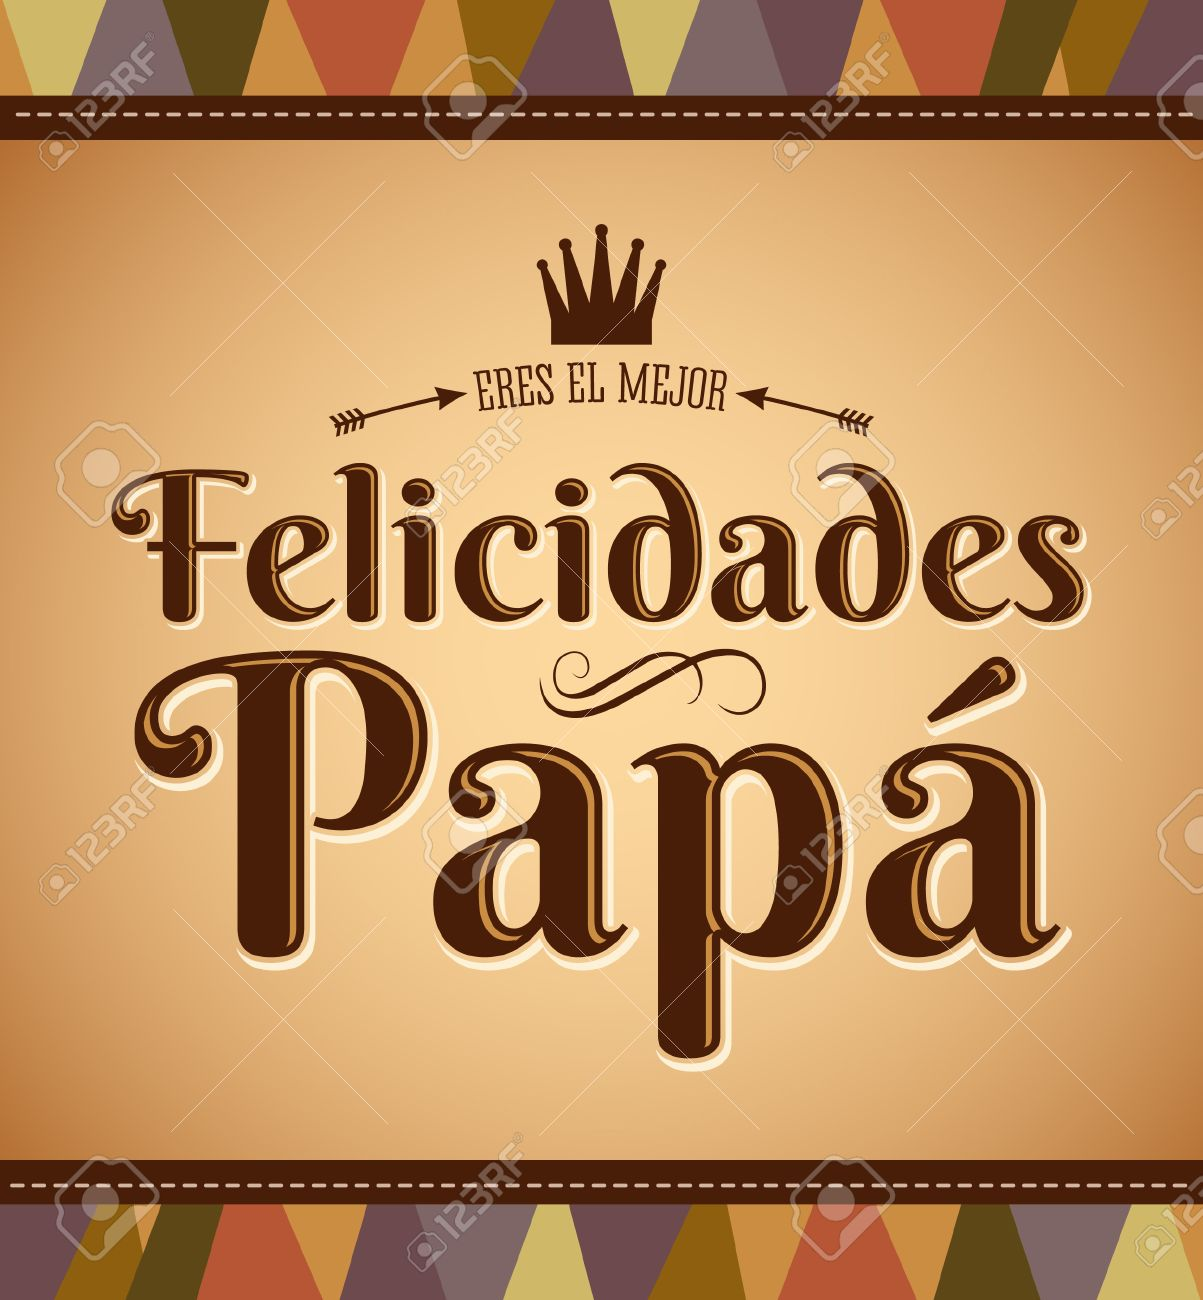 Felicidades Papa - Felicidades Papá - Español Texto - Vector De La ...